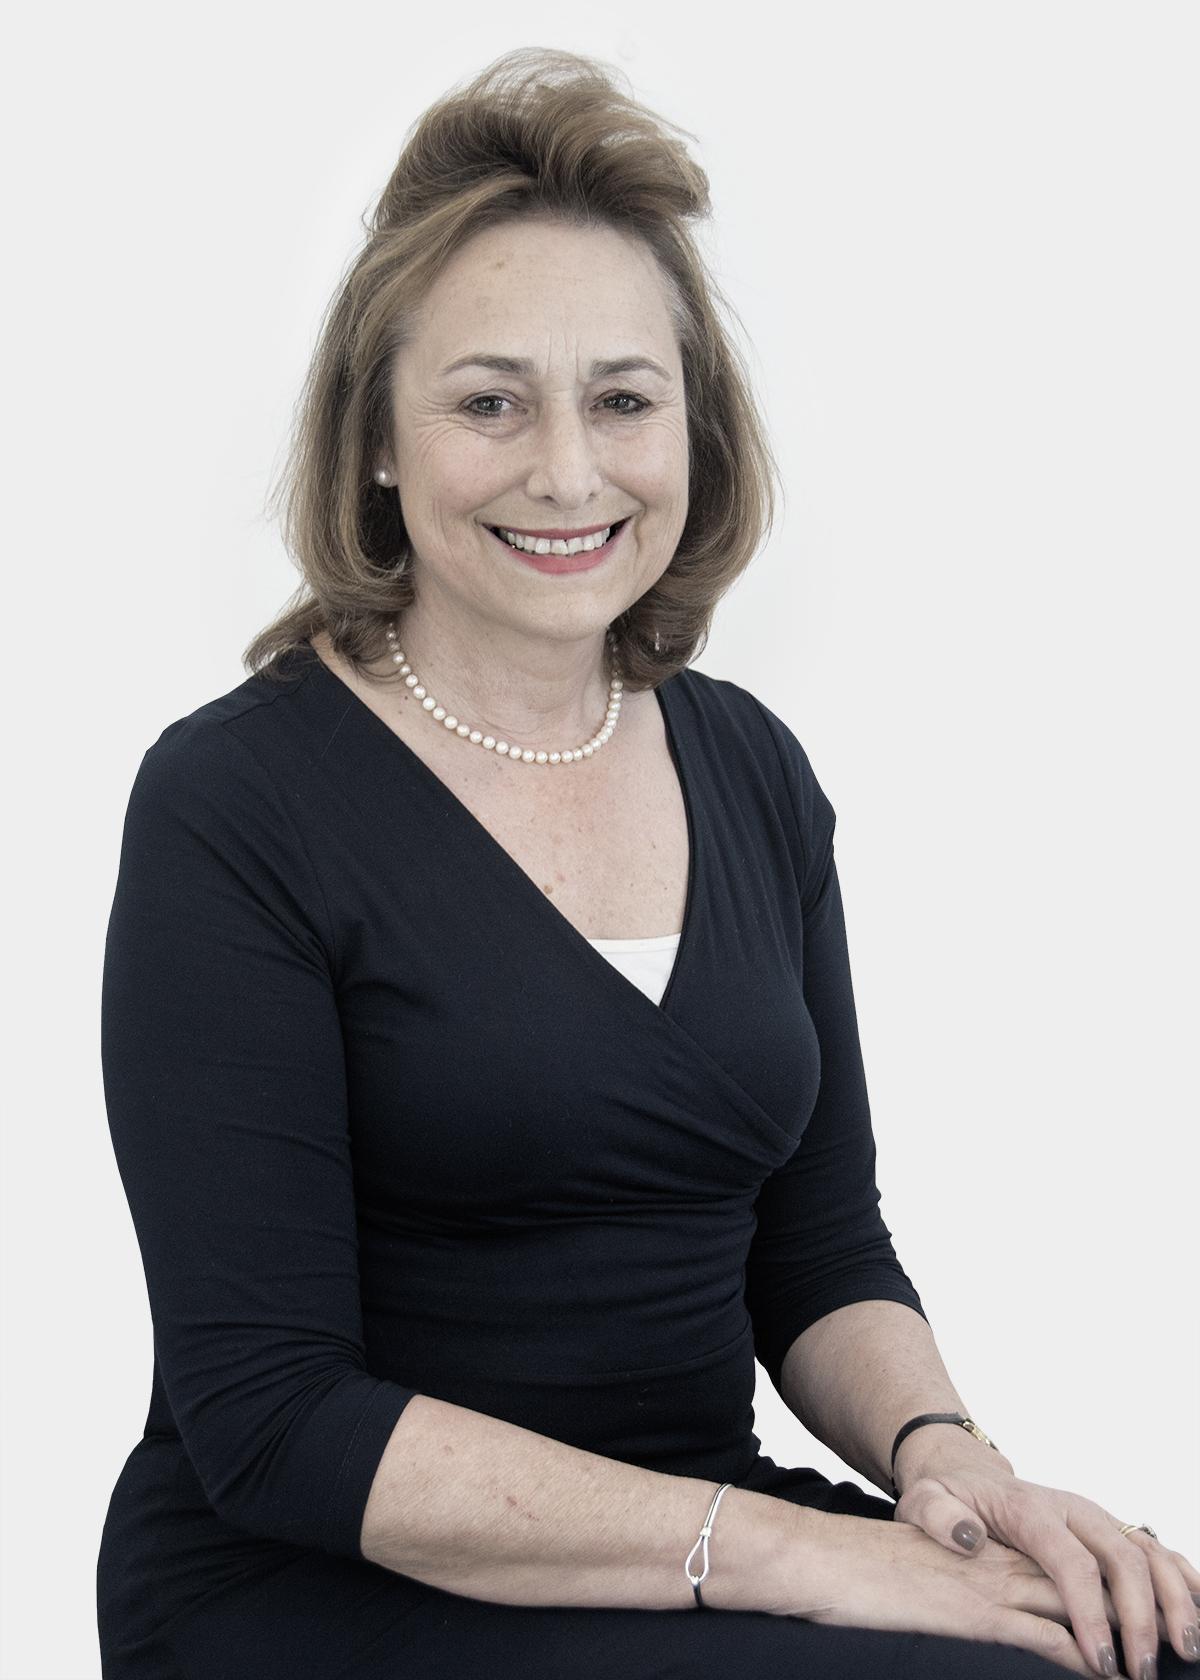 Sally Hobbs